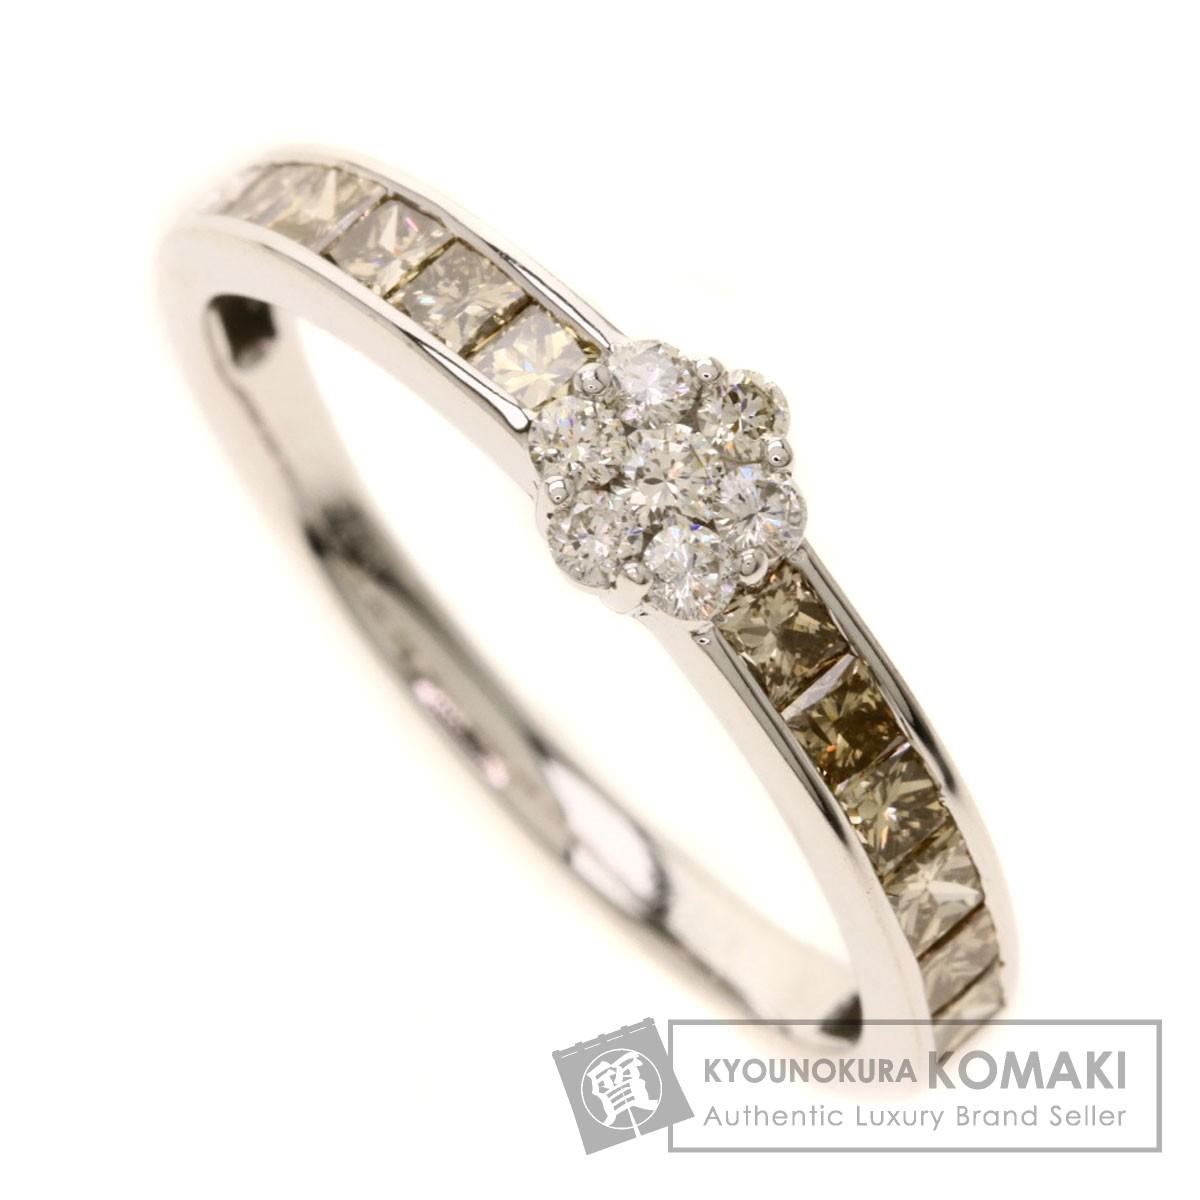 0.72ct ダイヤモンド リング・指輪 K18ホワイトゴールド 2.5g レディース 【中古】